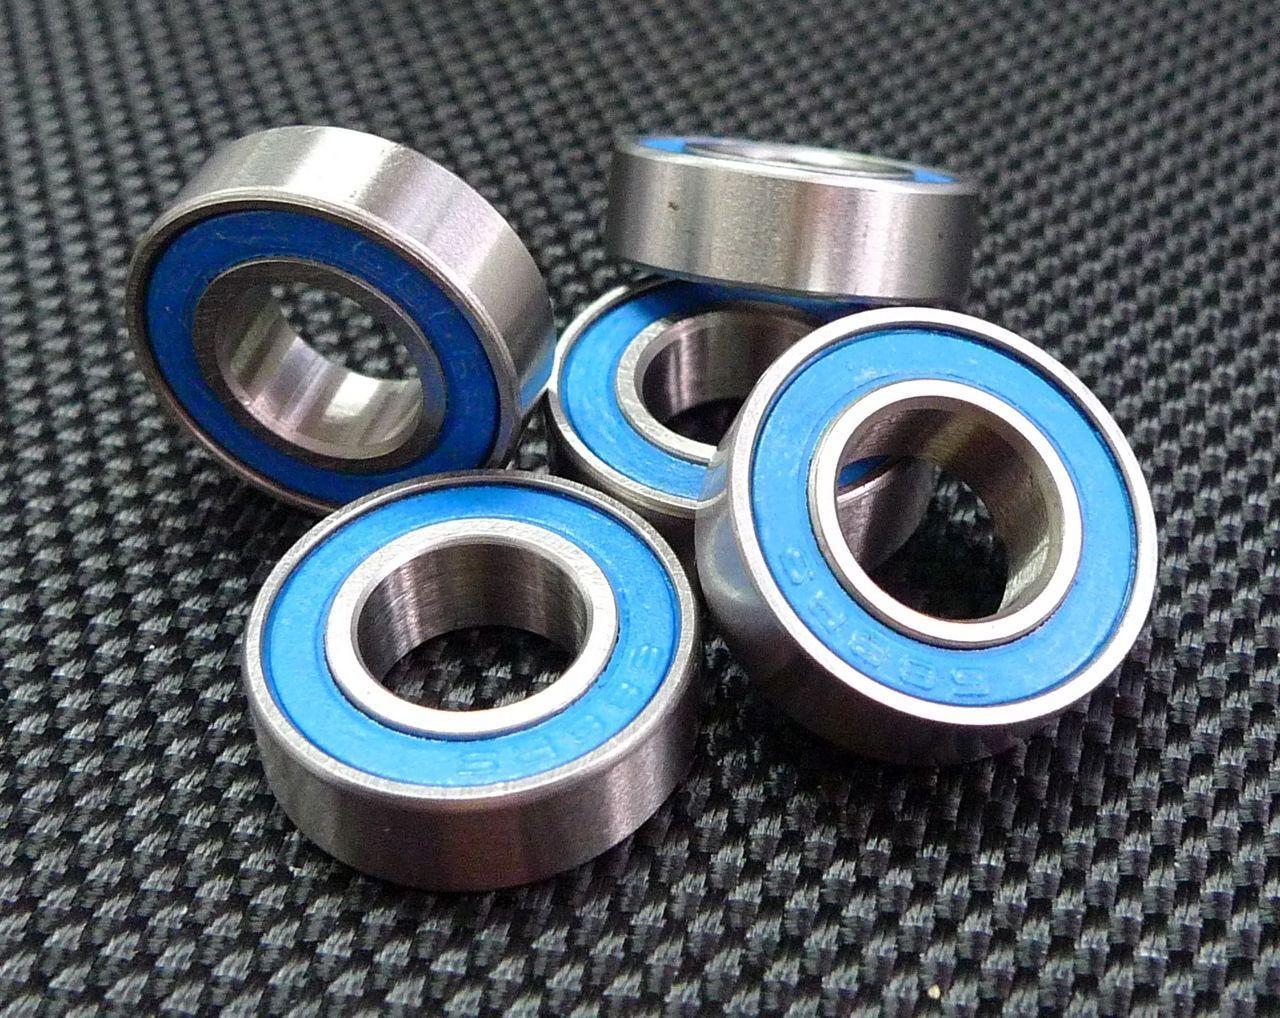 [100] 688-2rs pcs (8x16x5 mm) - kugellager mit blauen 688rs 8   5.